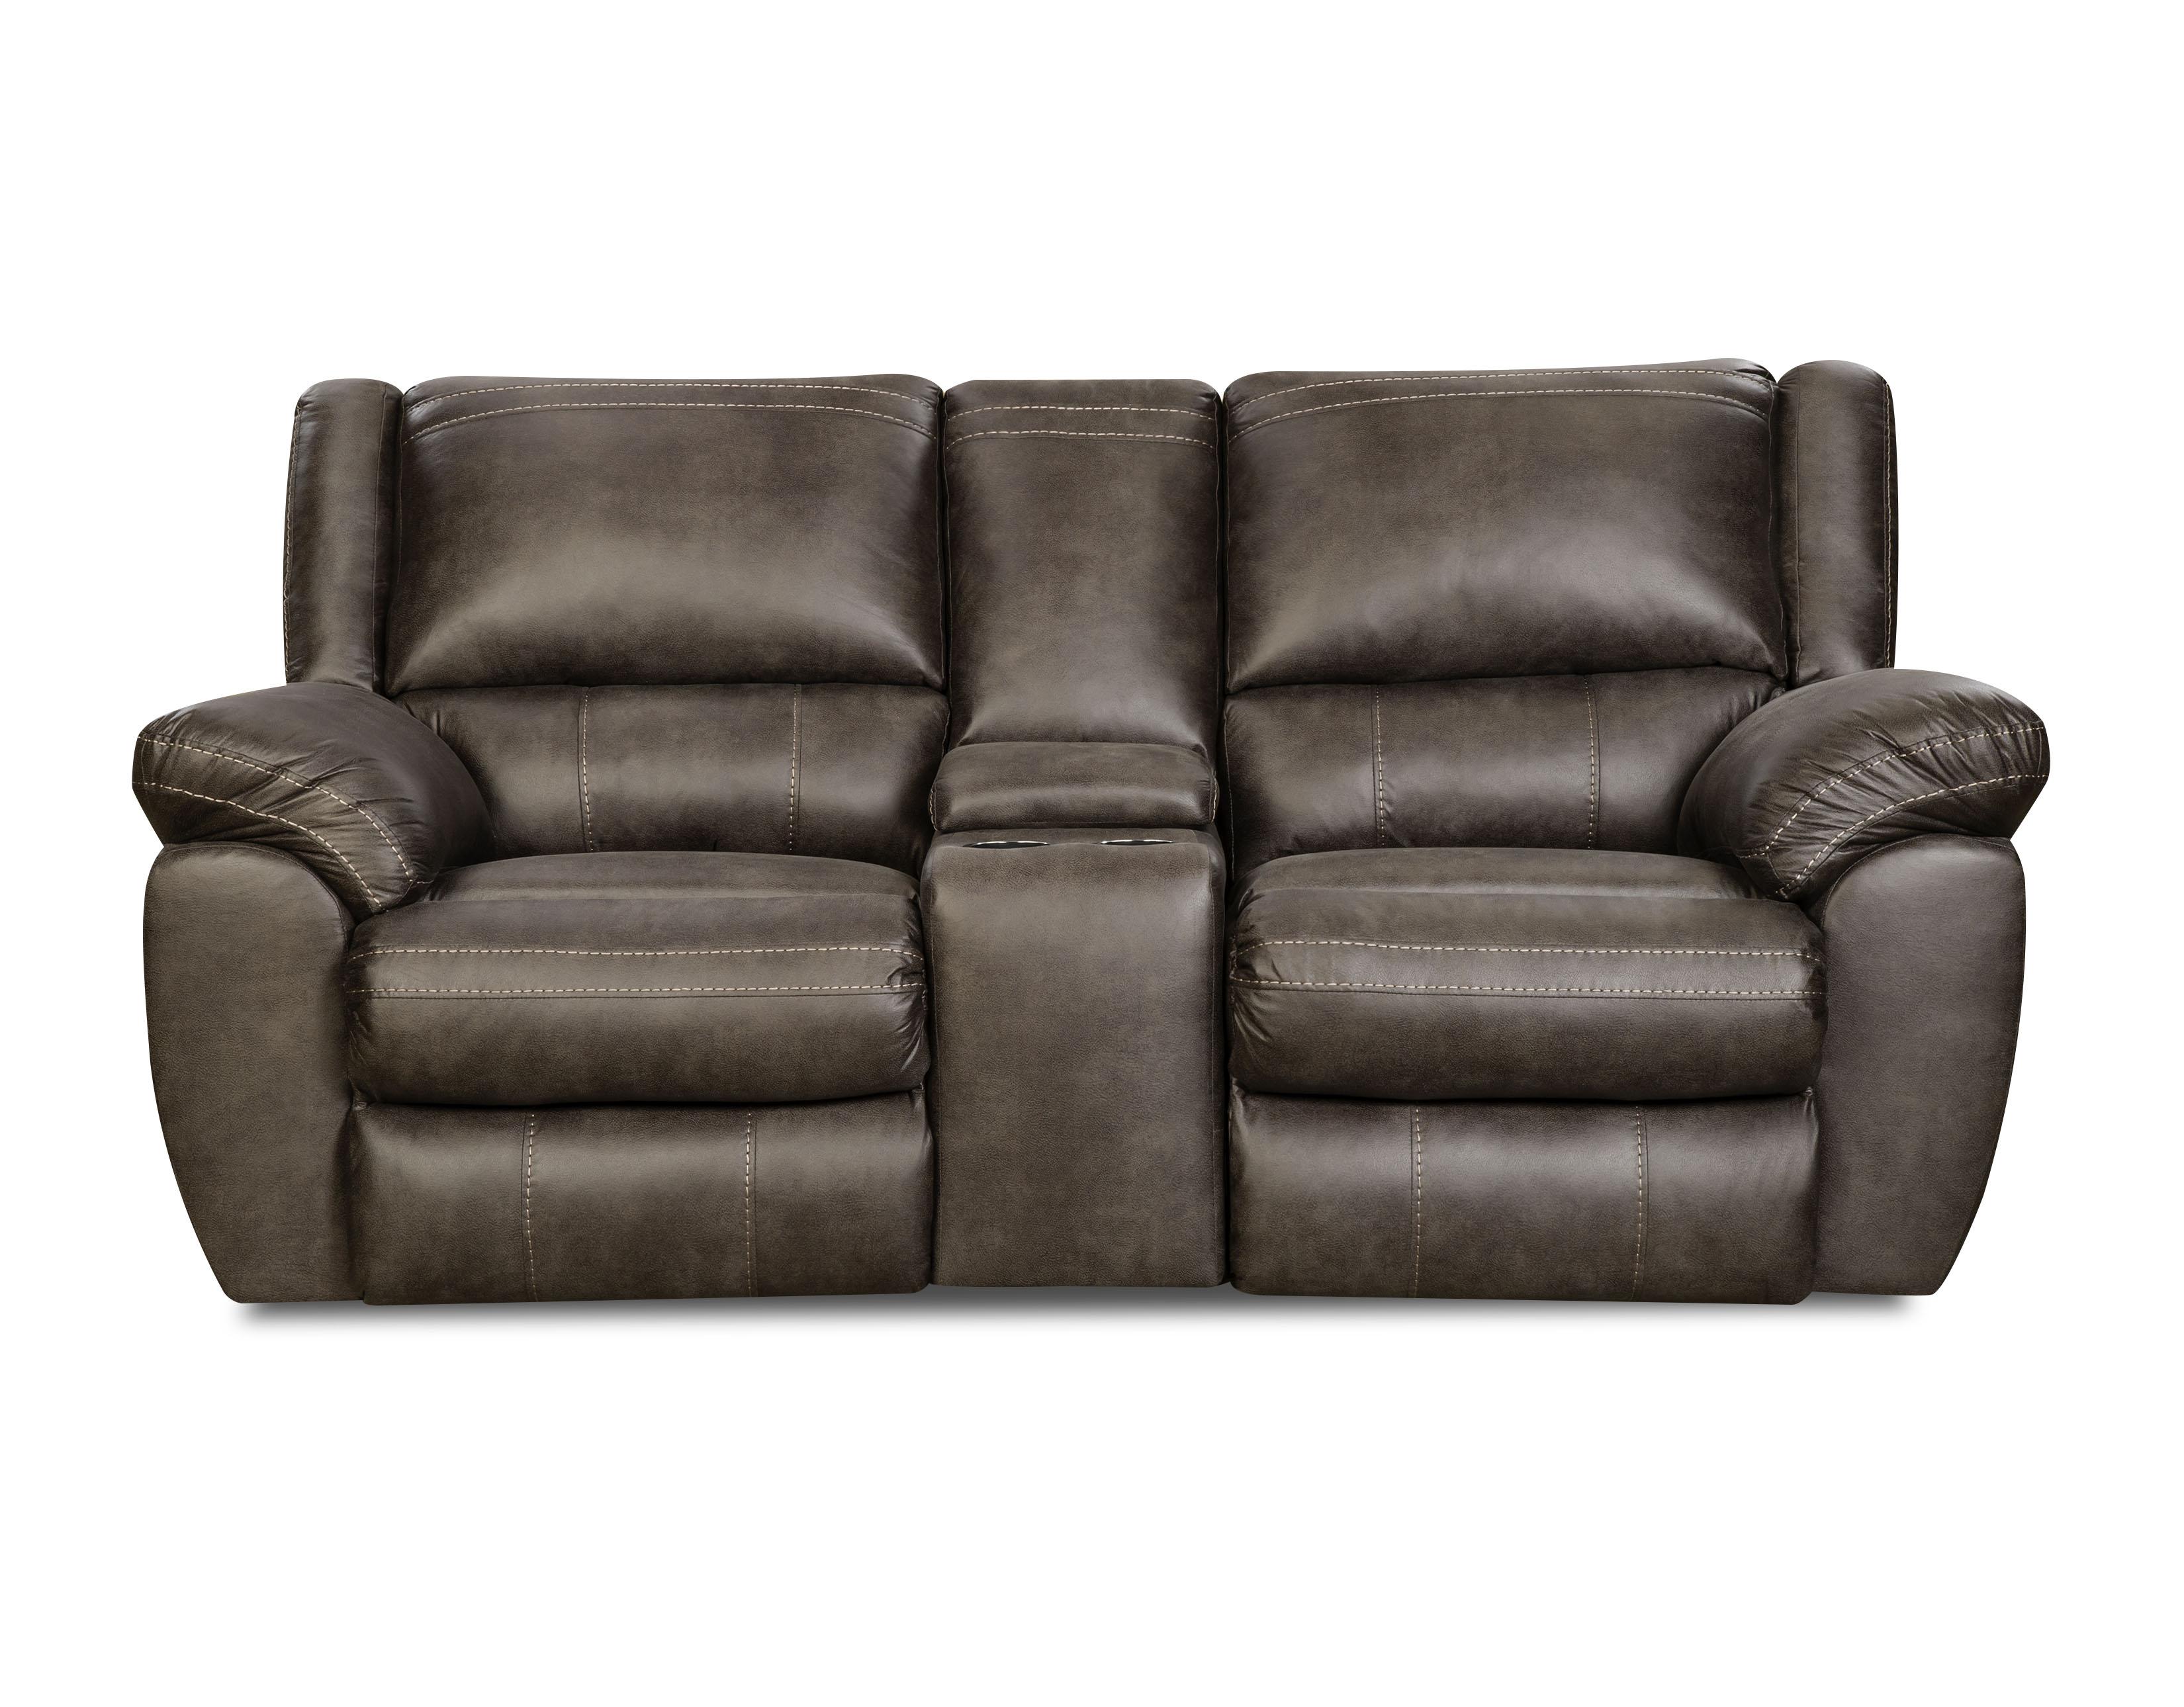 small sofas simmons mason power motion recliner loveseat - shiloh granite NVKUIMS